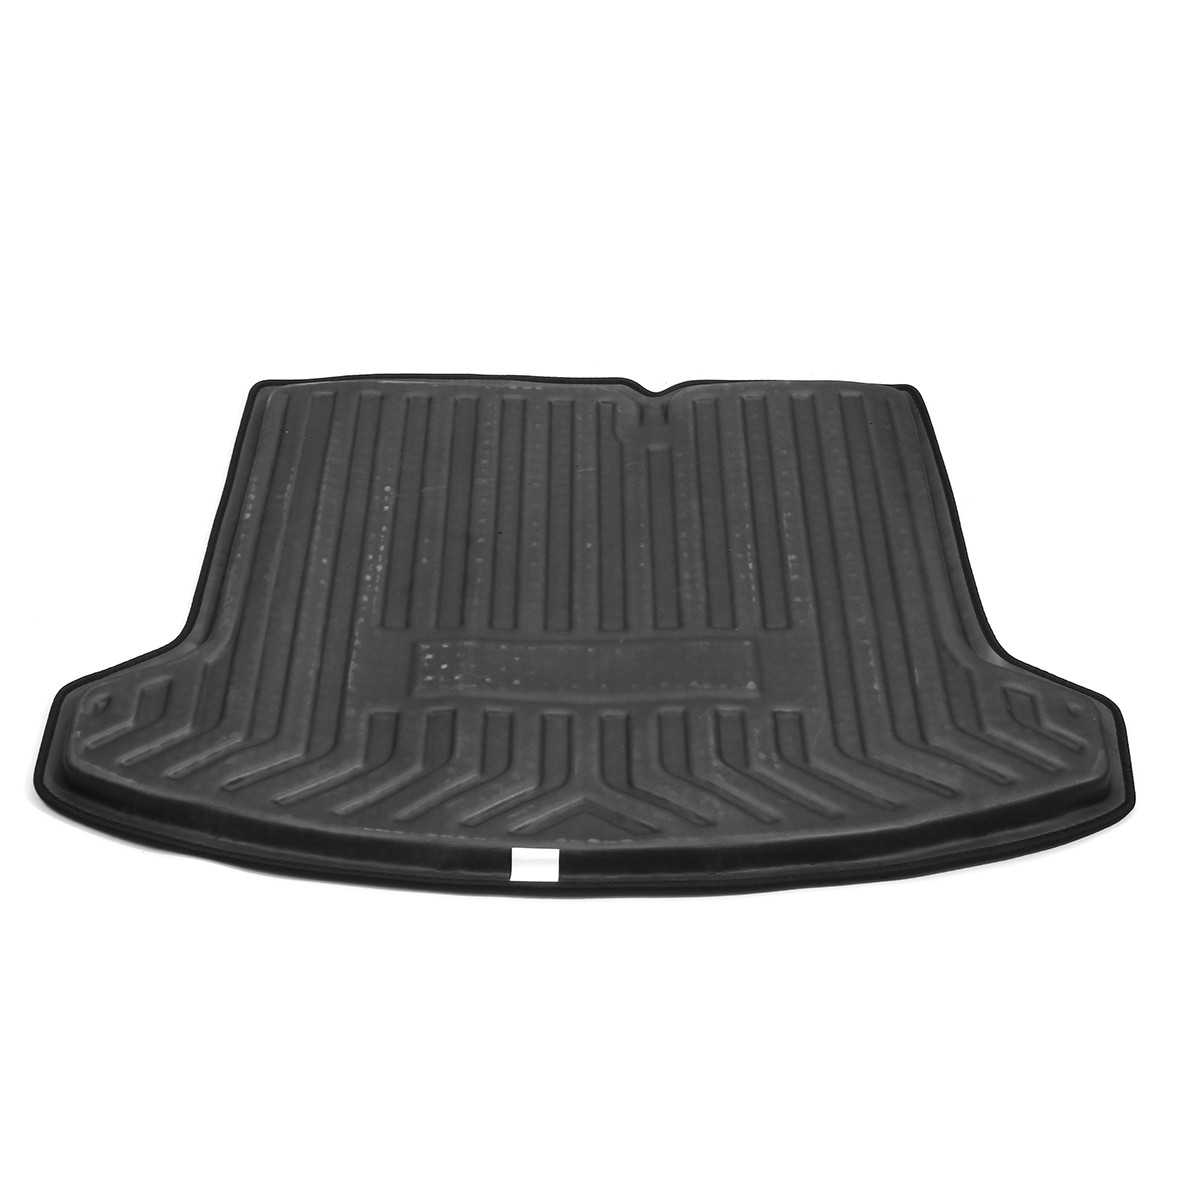 Задний багажник автомобиля Доставка Коврик в багажник Коврик для Nissan Kicks 2017-2018 - 1TopShop